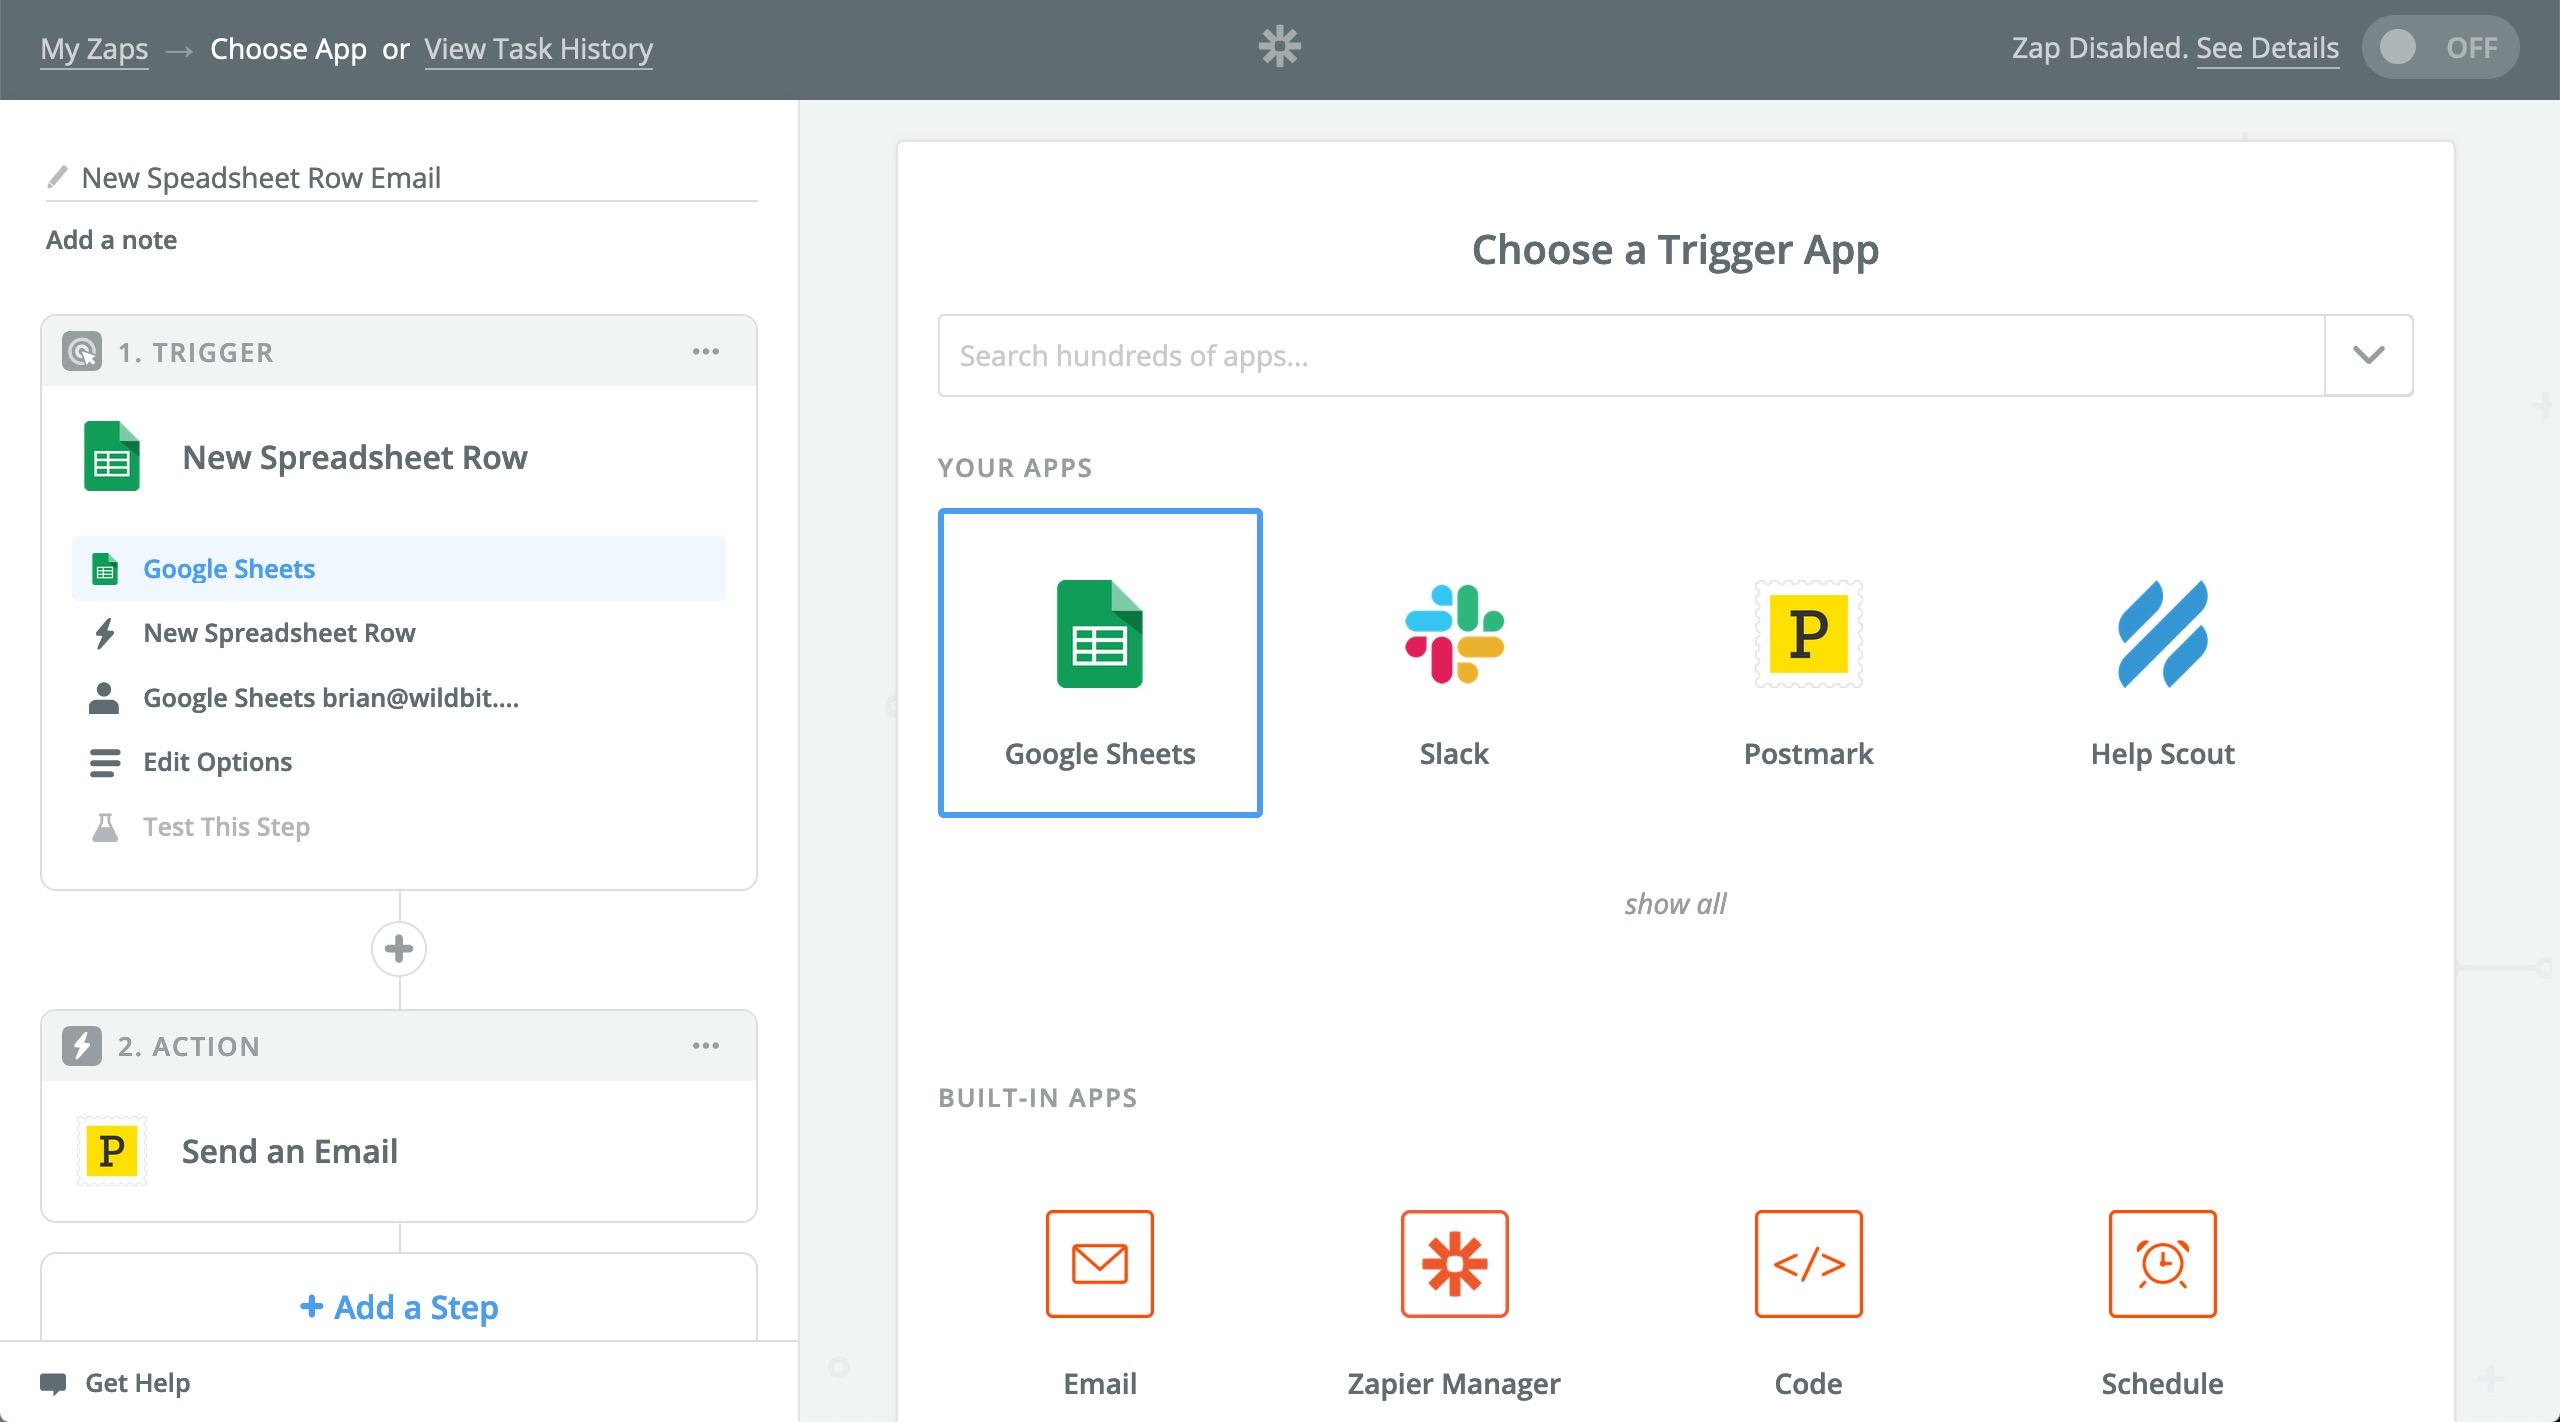 Choose Google Sheets as a Trigger App